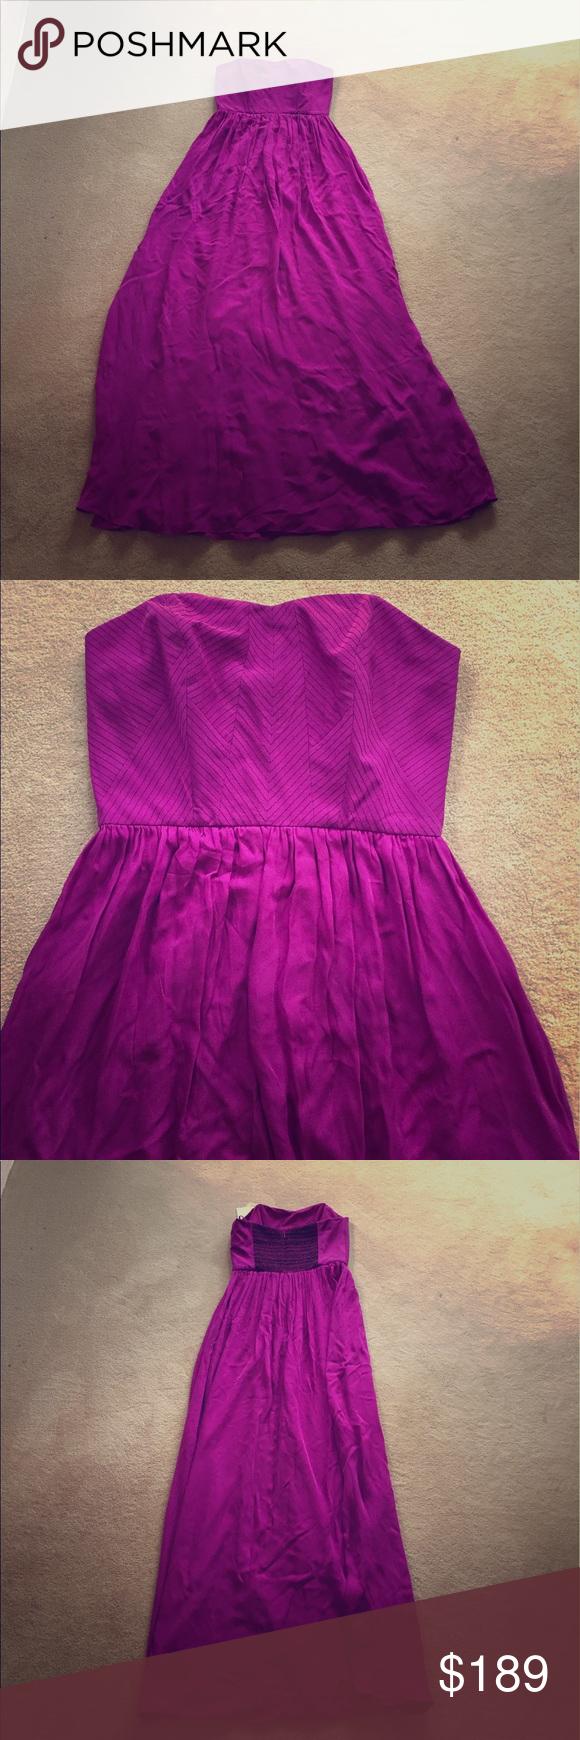 NWT Nicole Miller Pink Bodice Maxi Dress